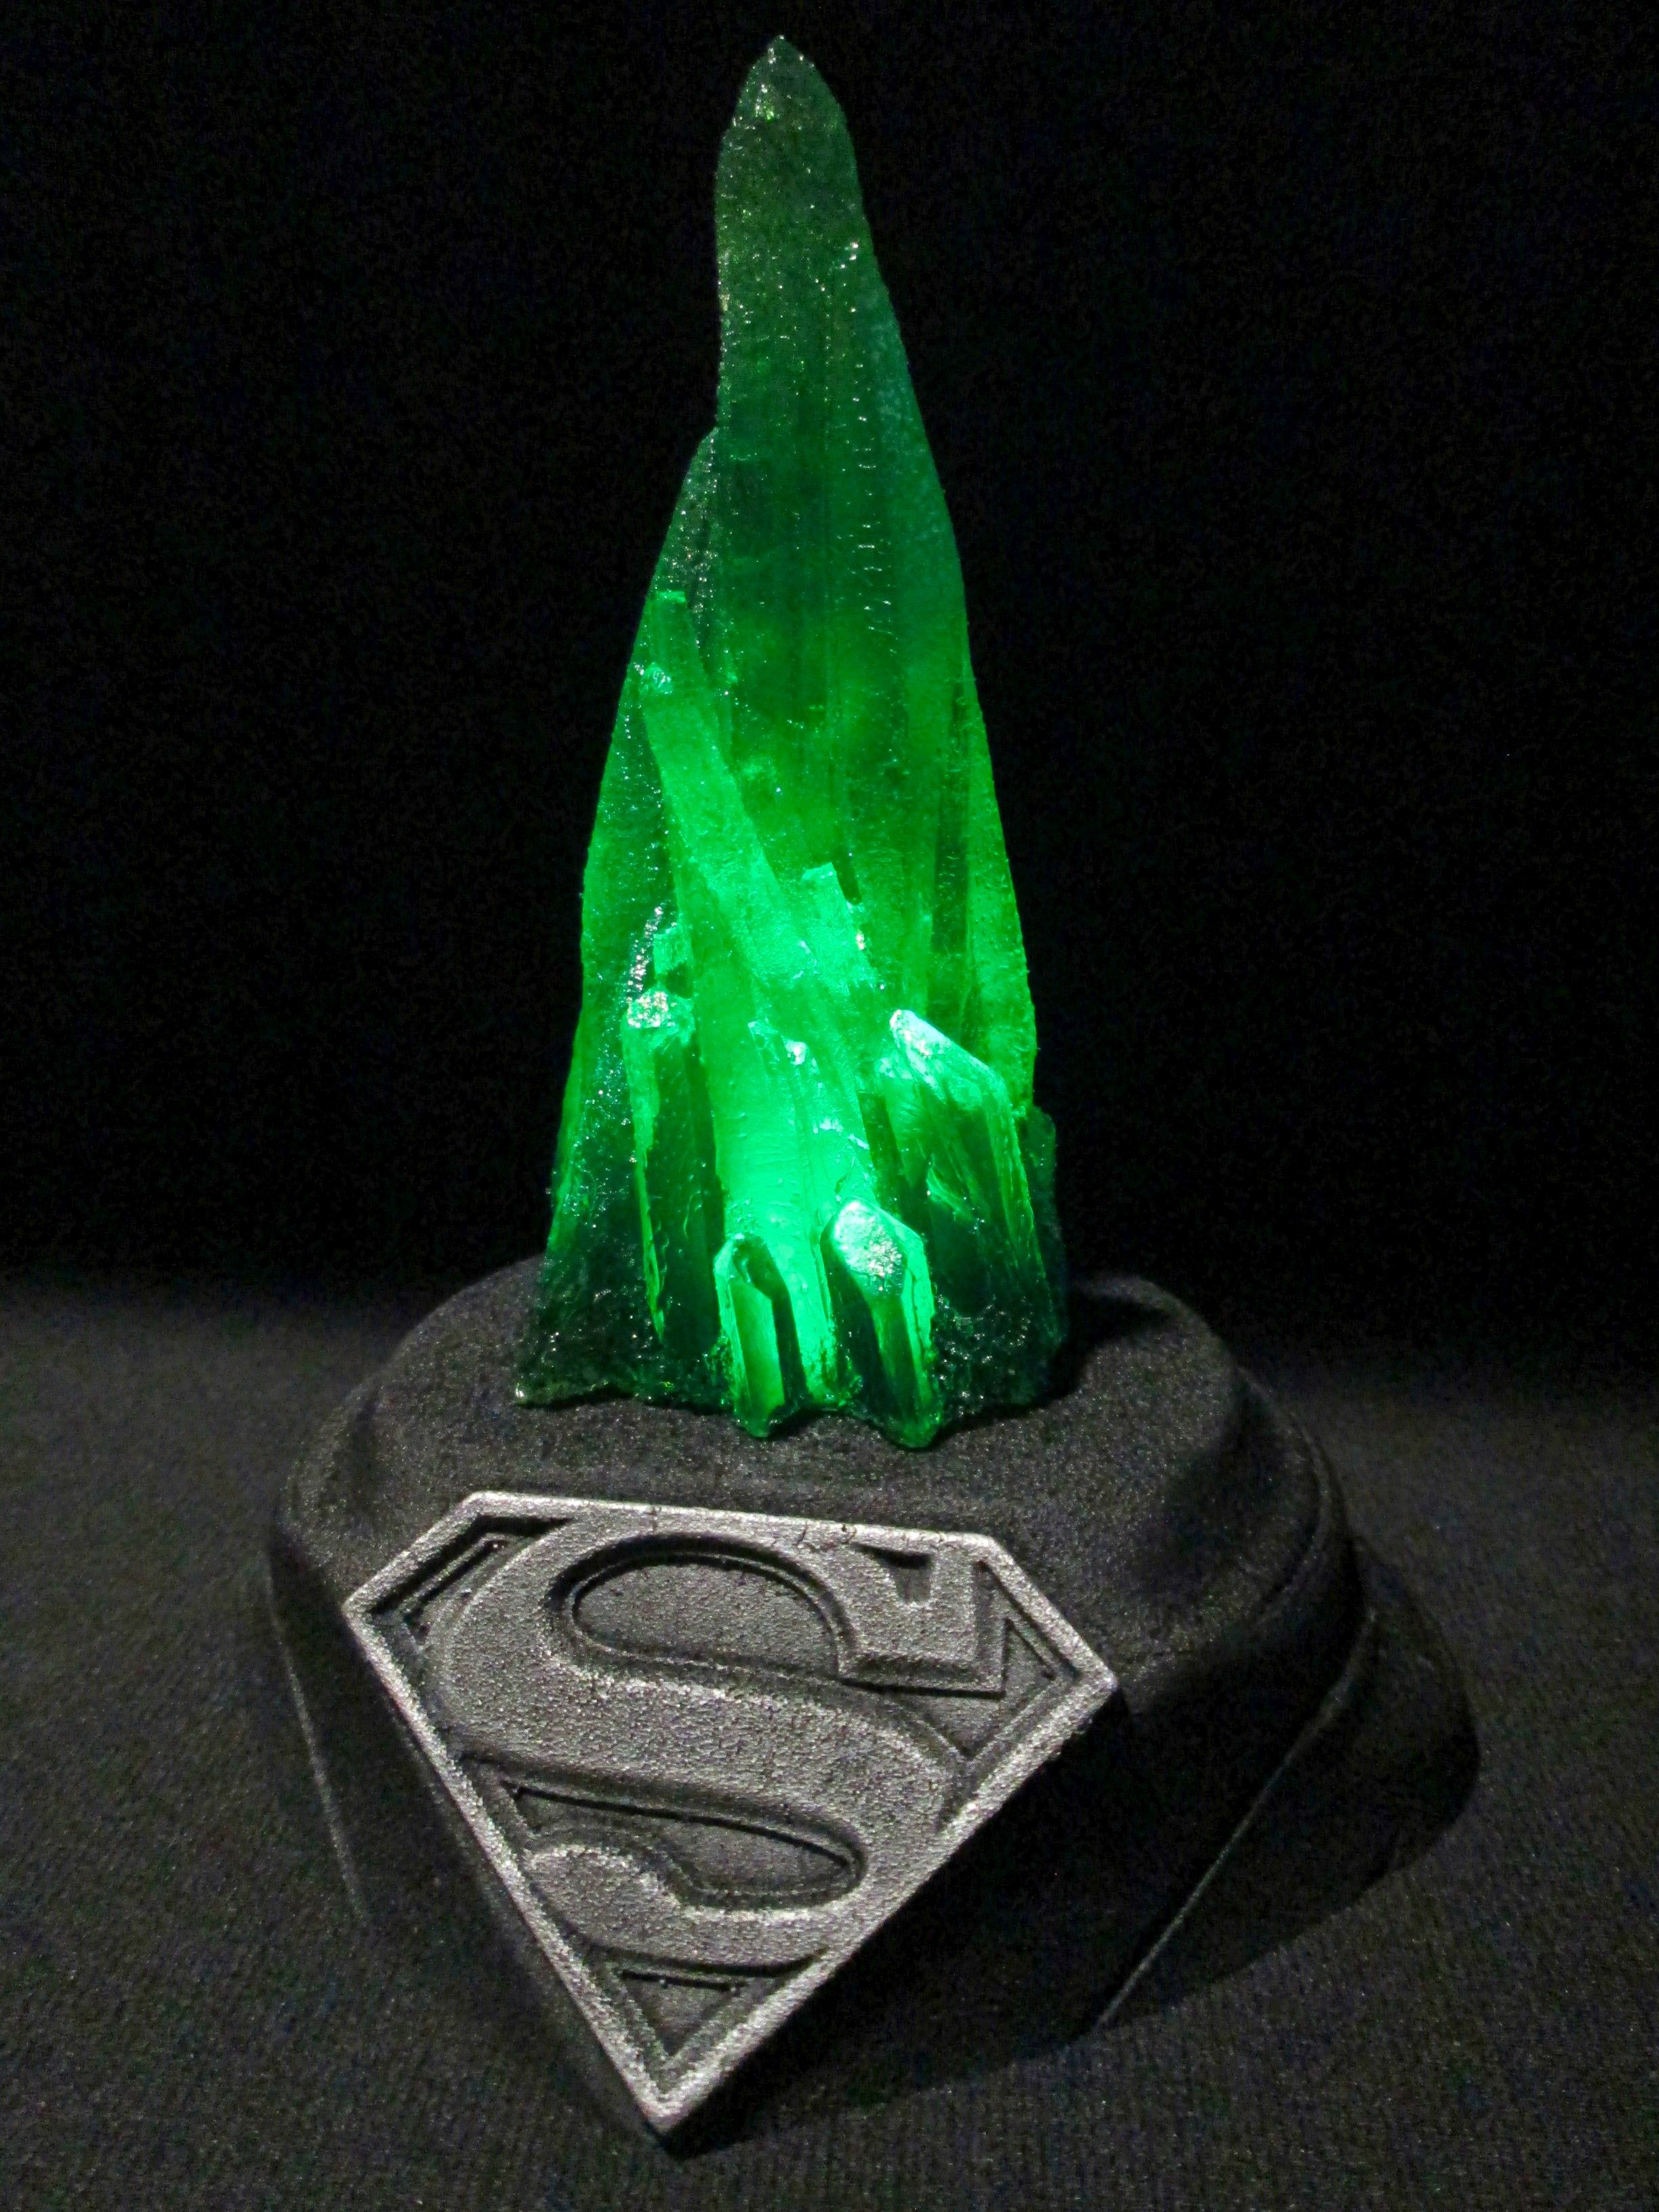 Kryptonite Light Up Replica Glow In The Dark Superman Supergirl